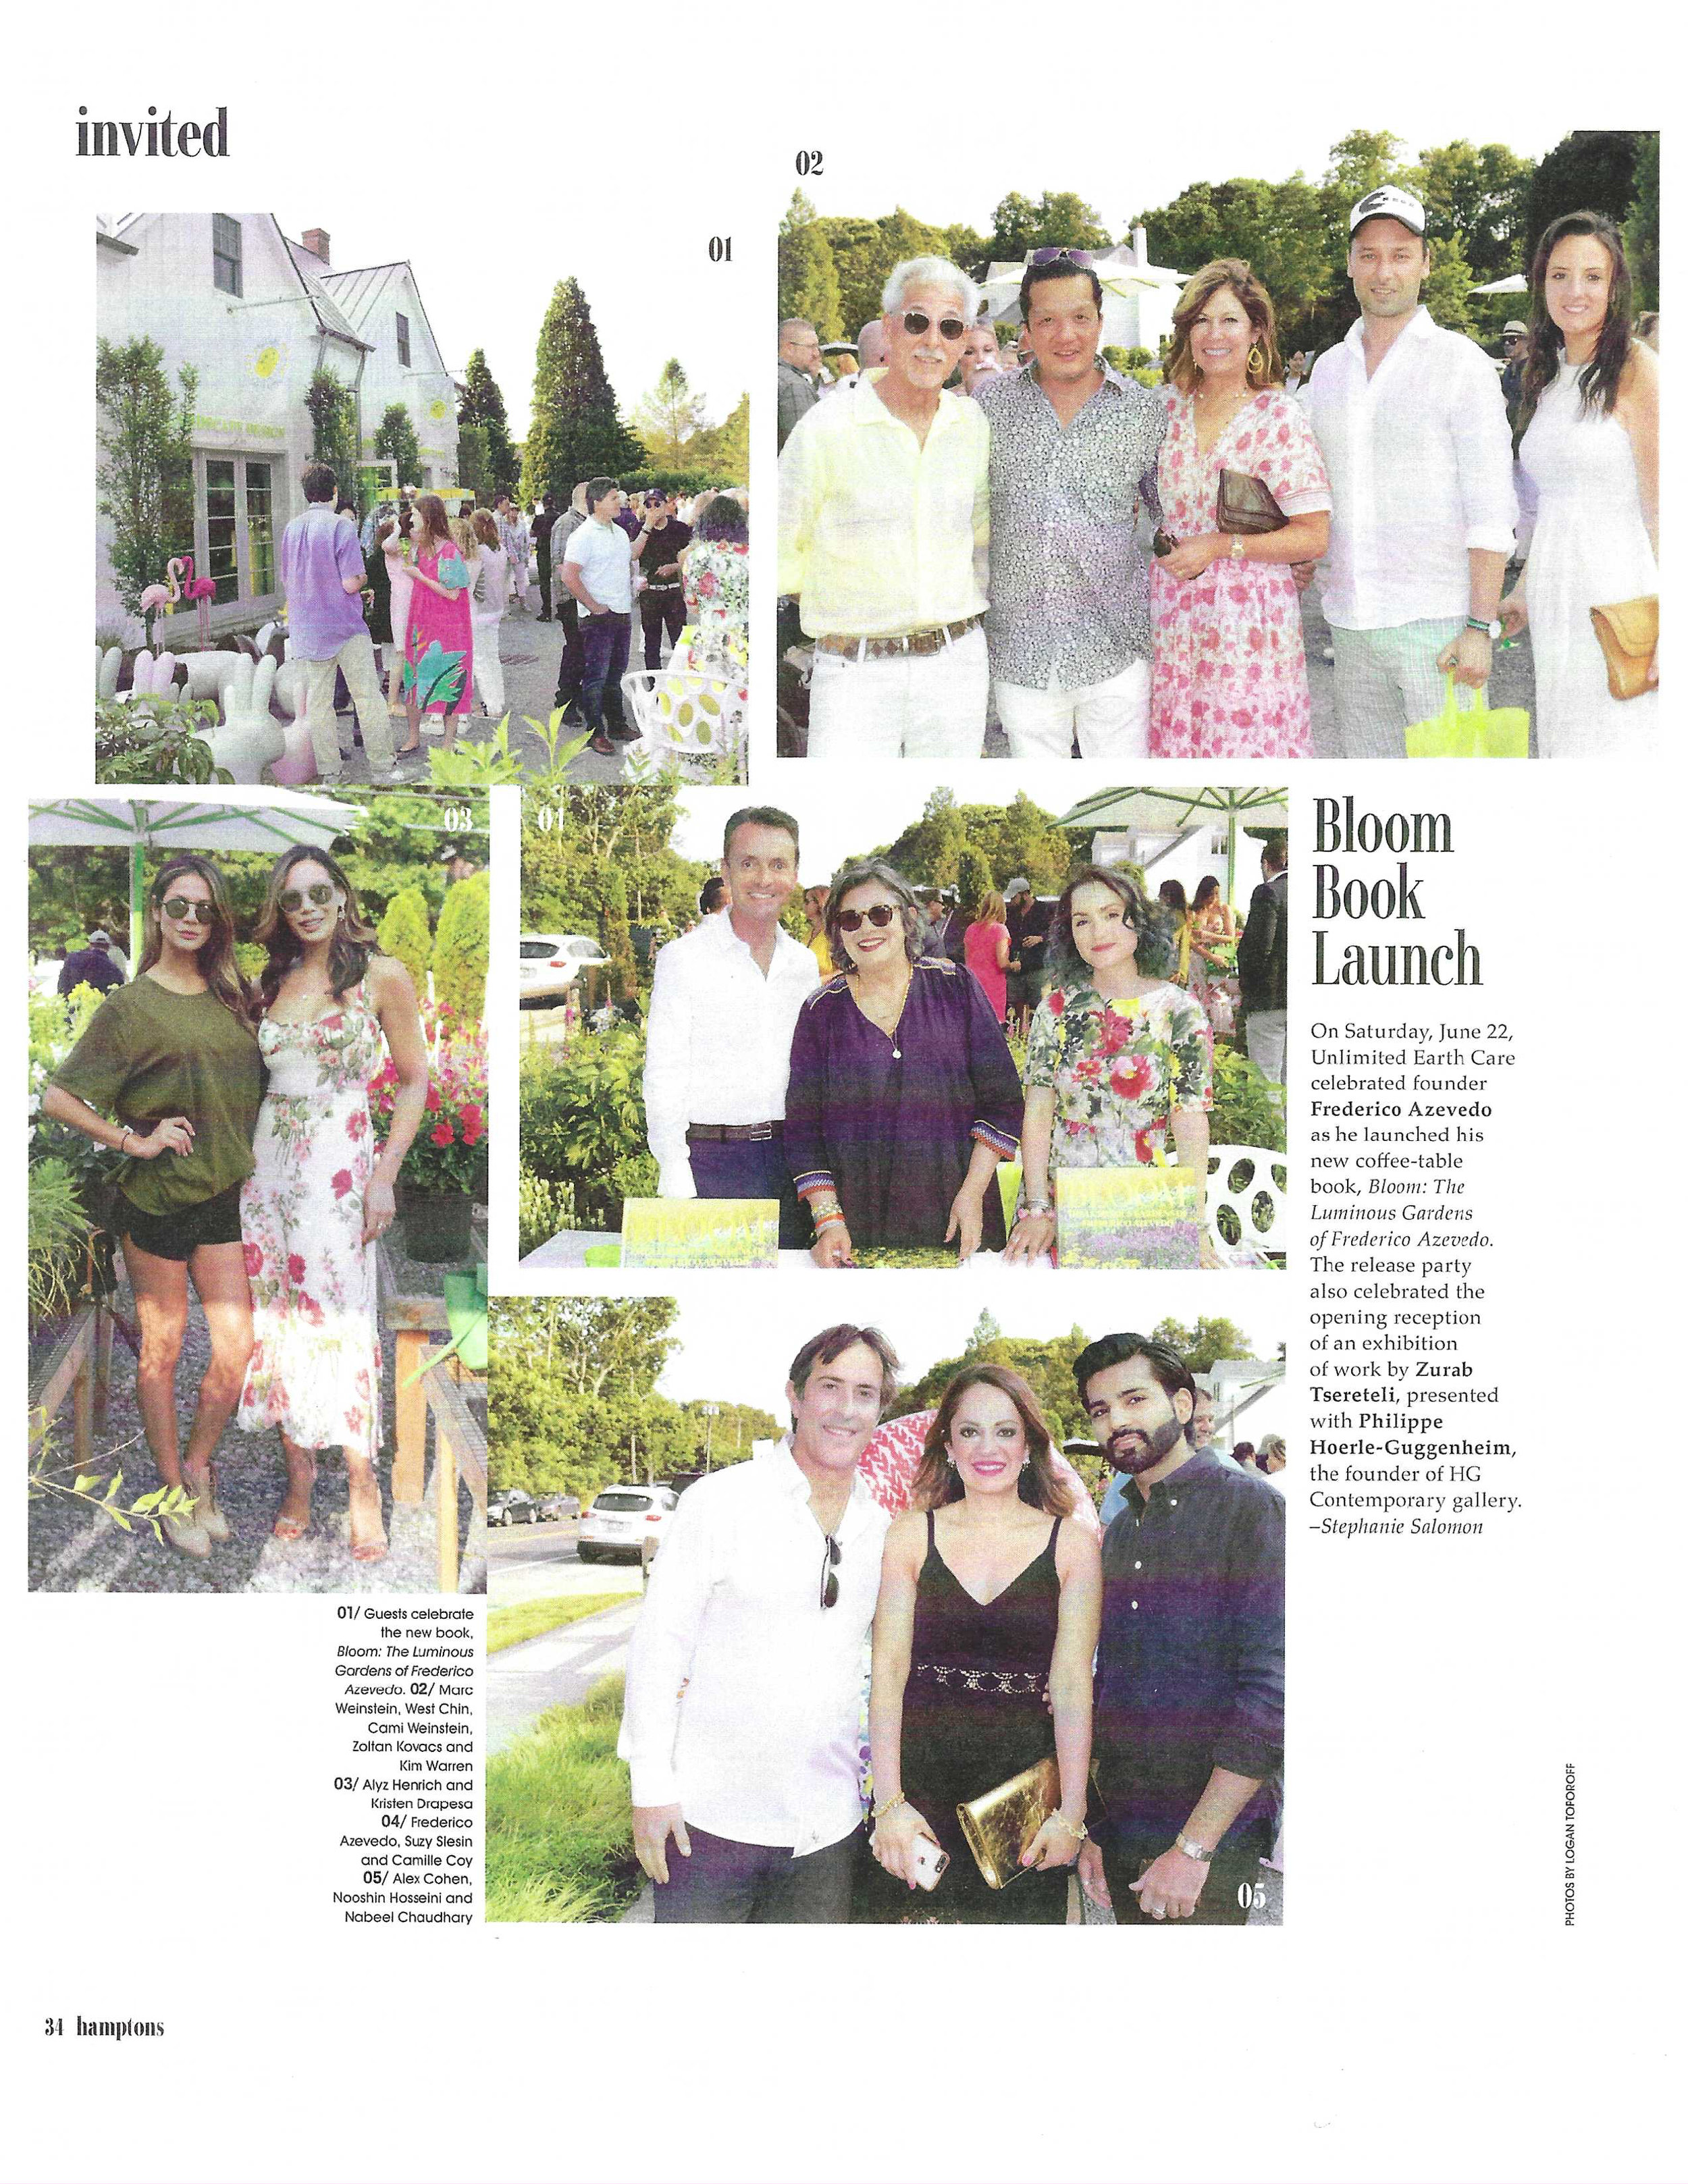 18 Hamptons Magazine - July17_2019 1.jpg